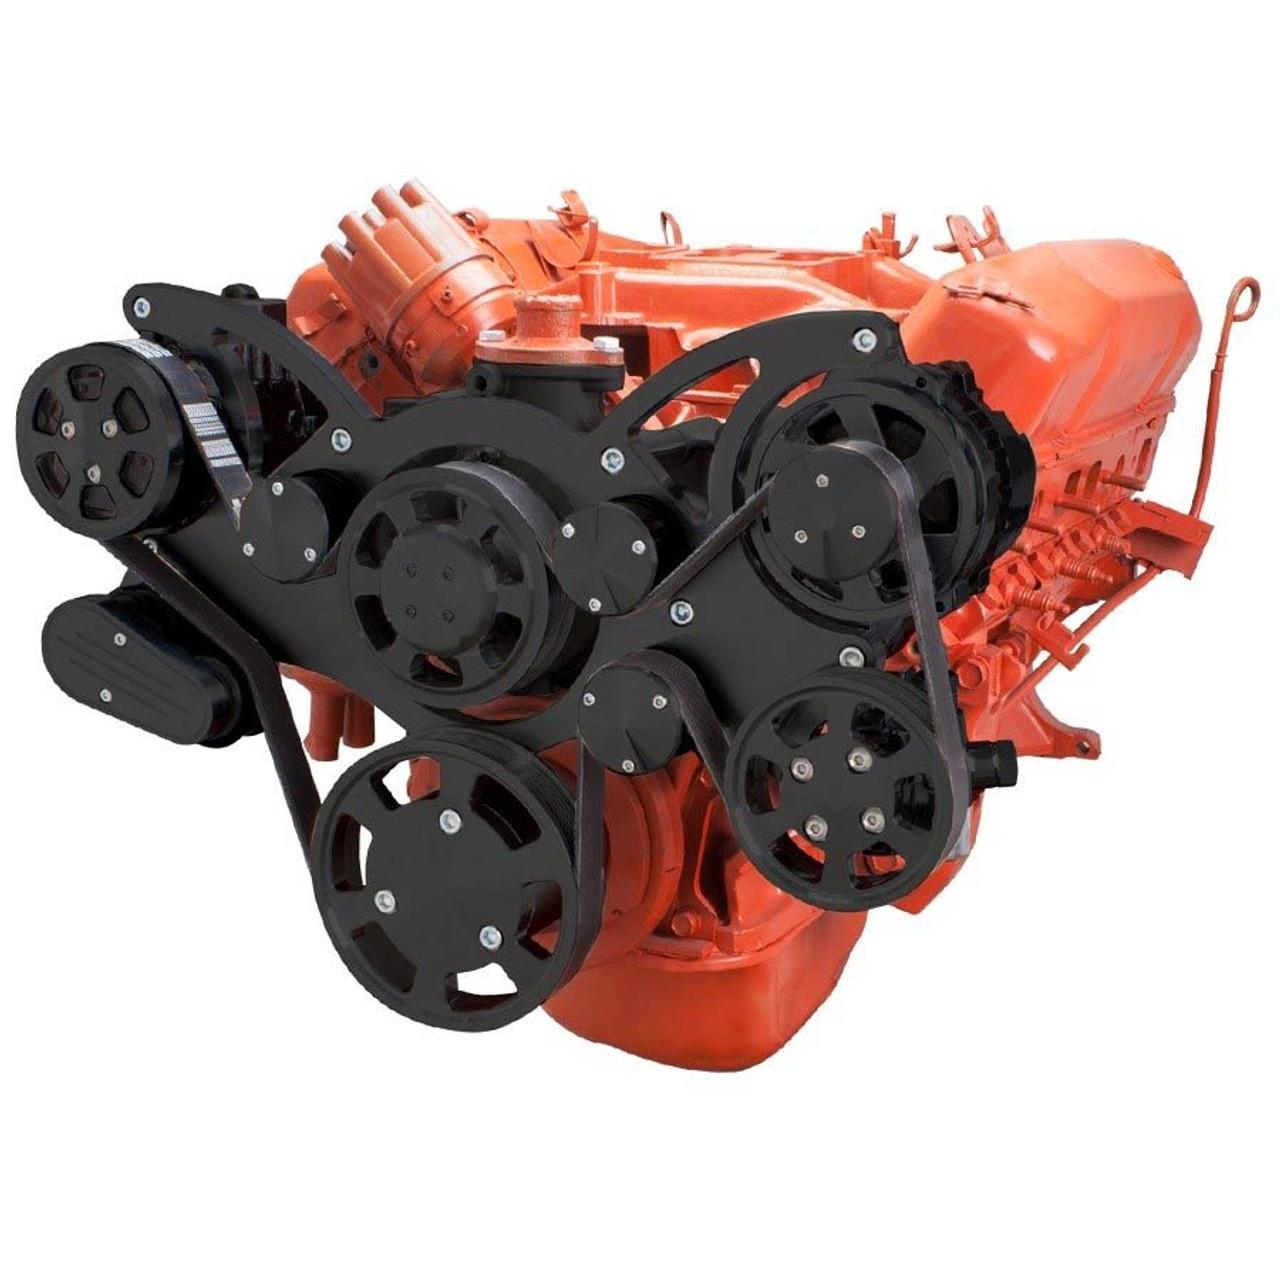 Stealth Black Serpentine System for Big Block Mopar - AC, Power Steering &  Alternator - All Inclusive